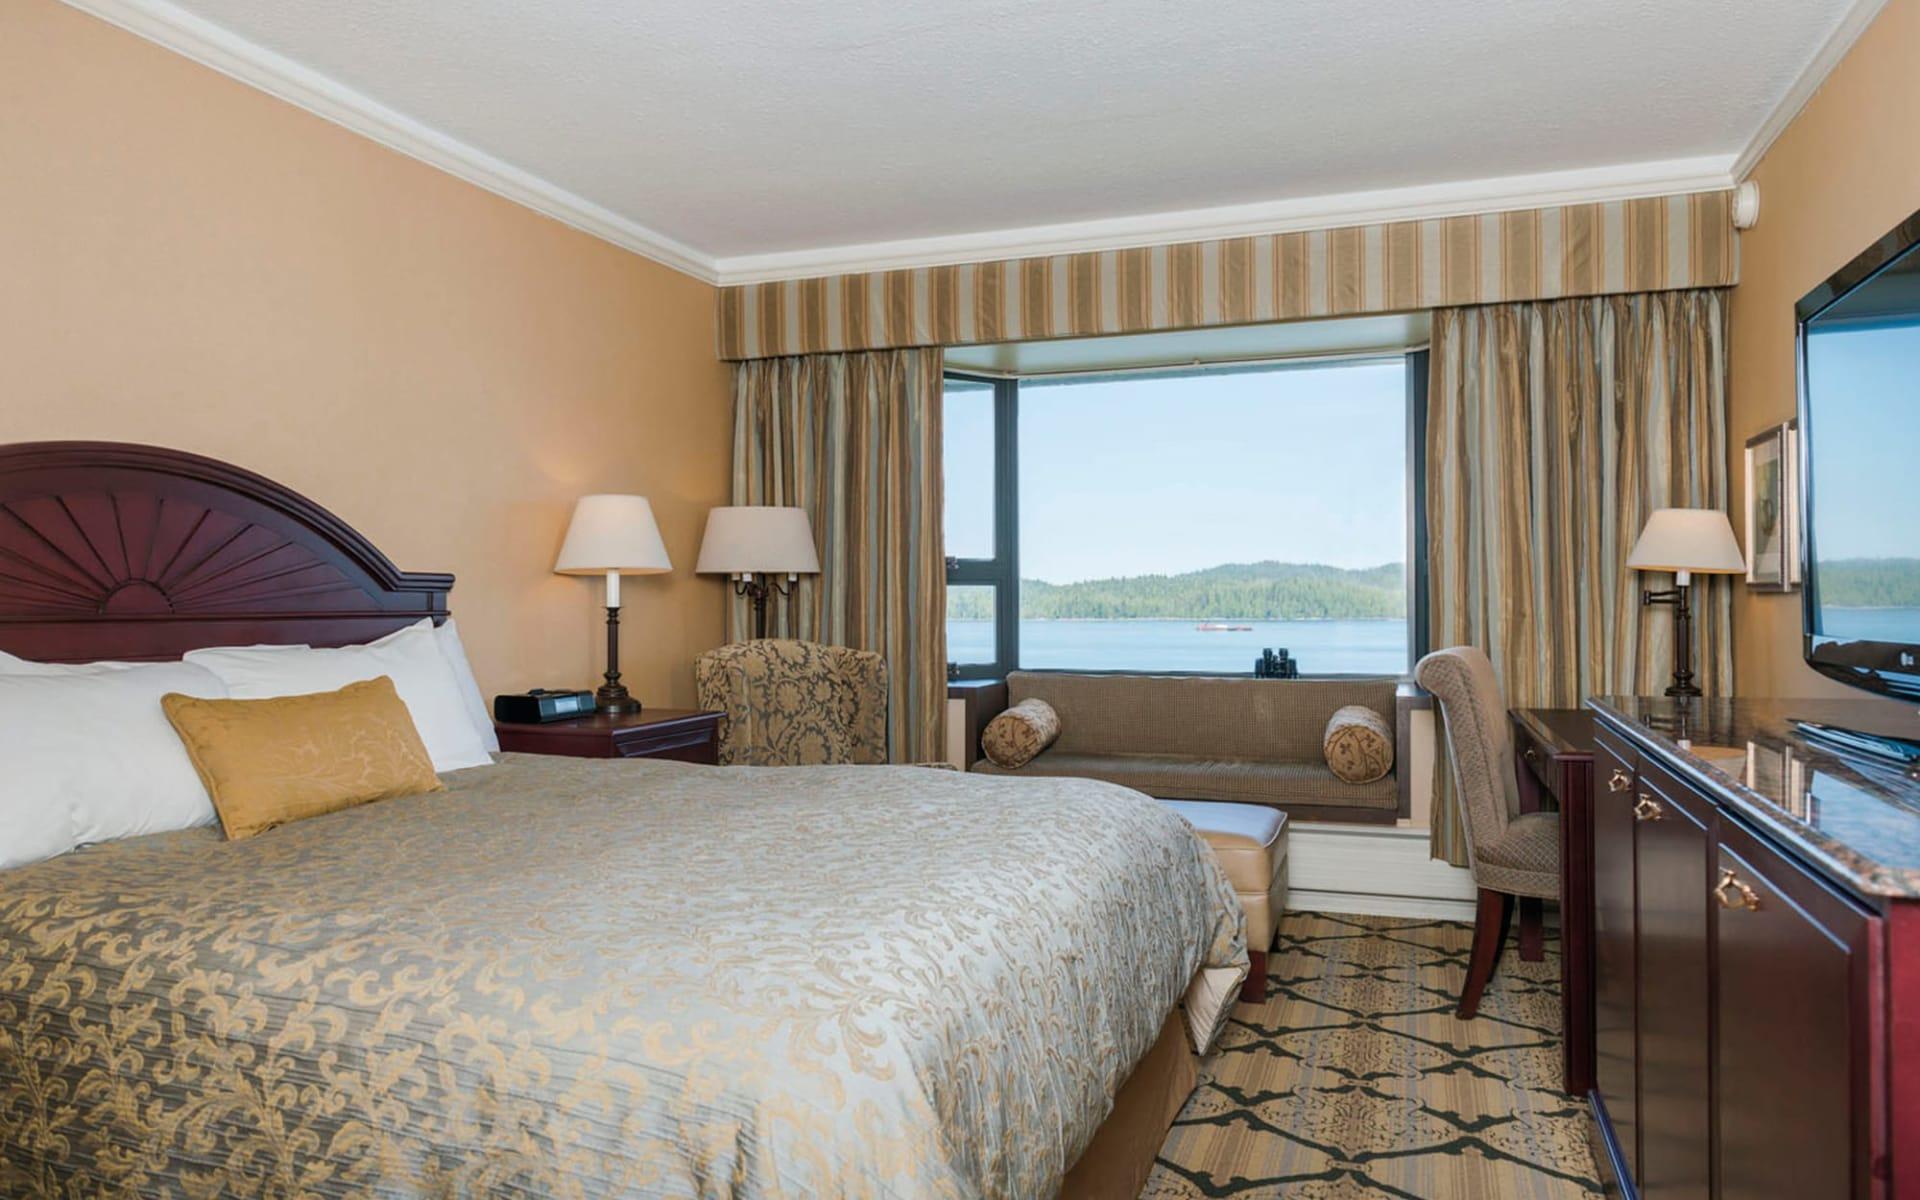 Crest Hotel in Prince Rupert: zimmer_Crest Hotel_CrestClassHarbourViewRoom(Standard)